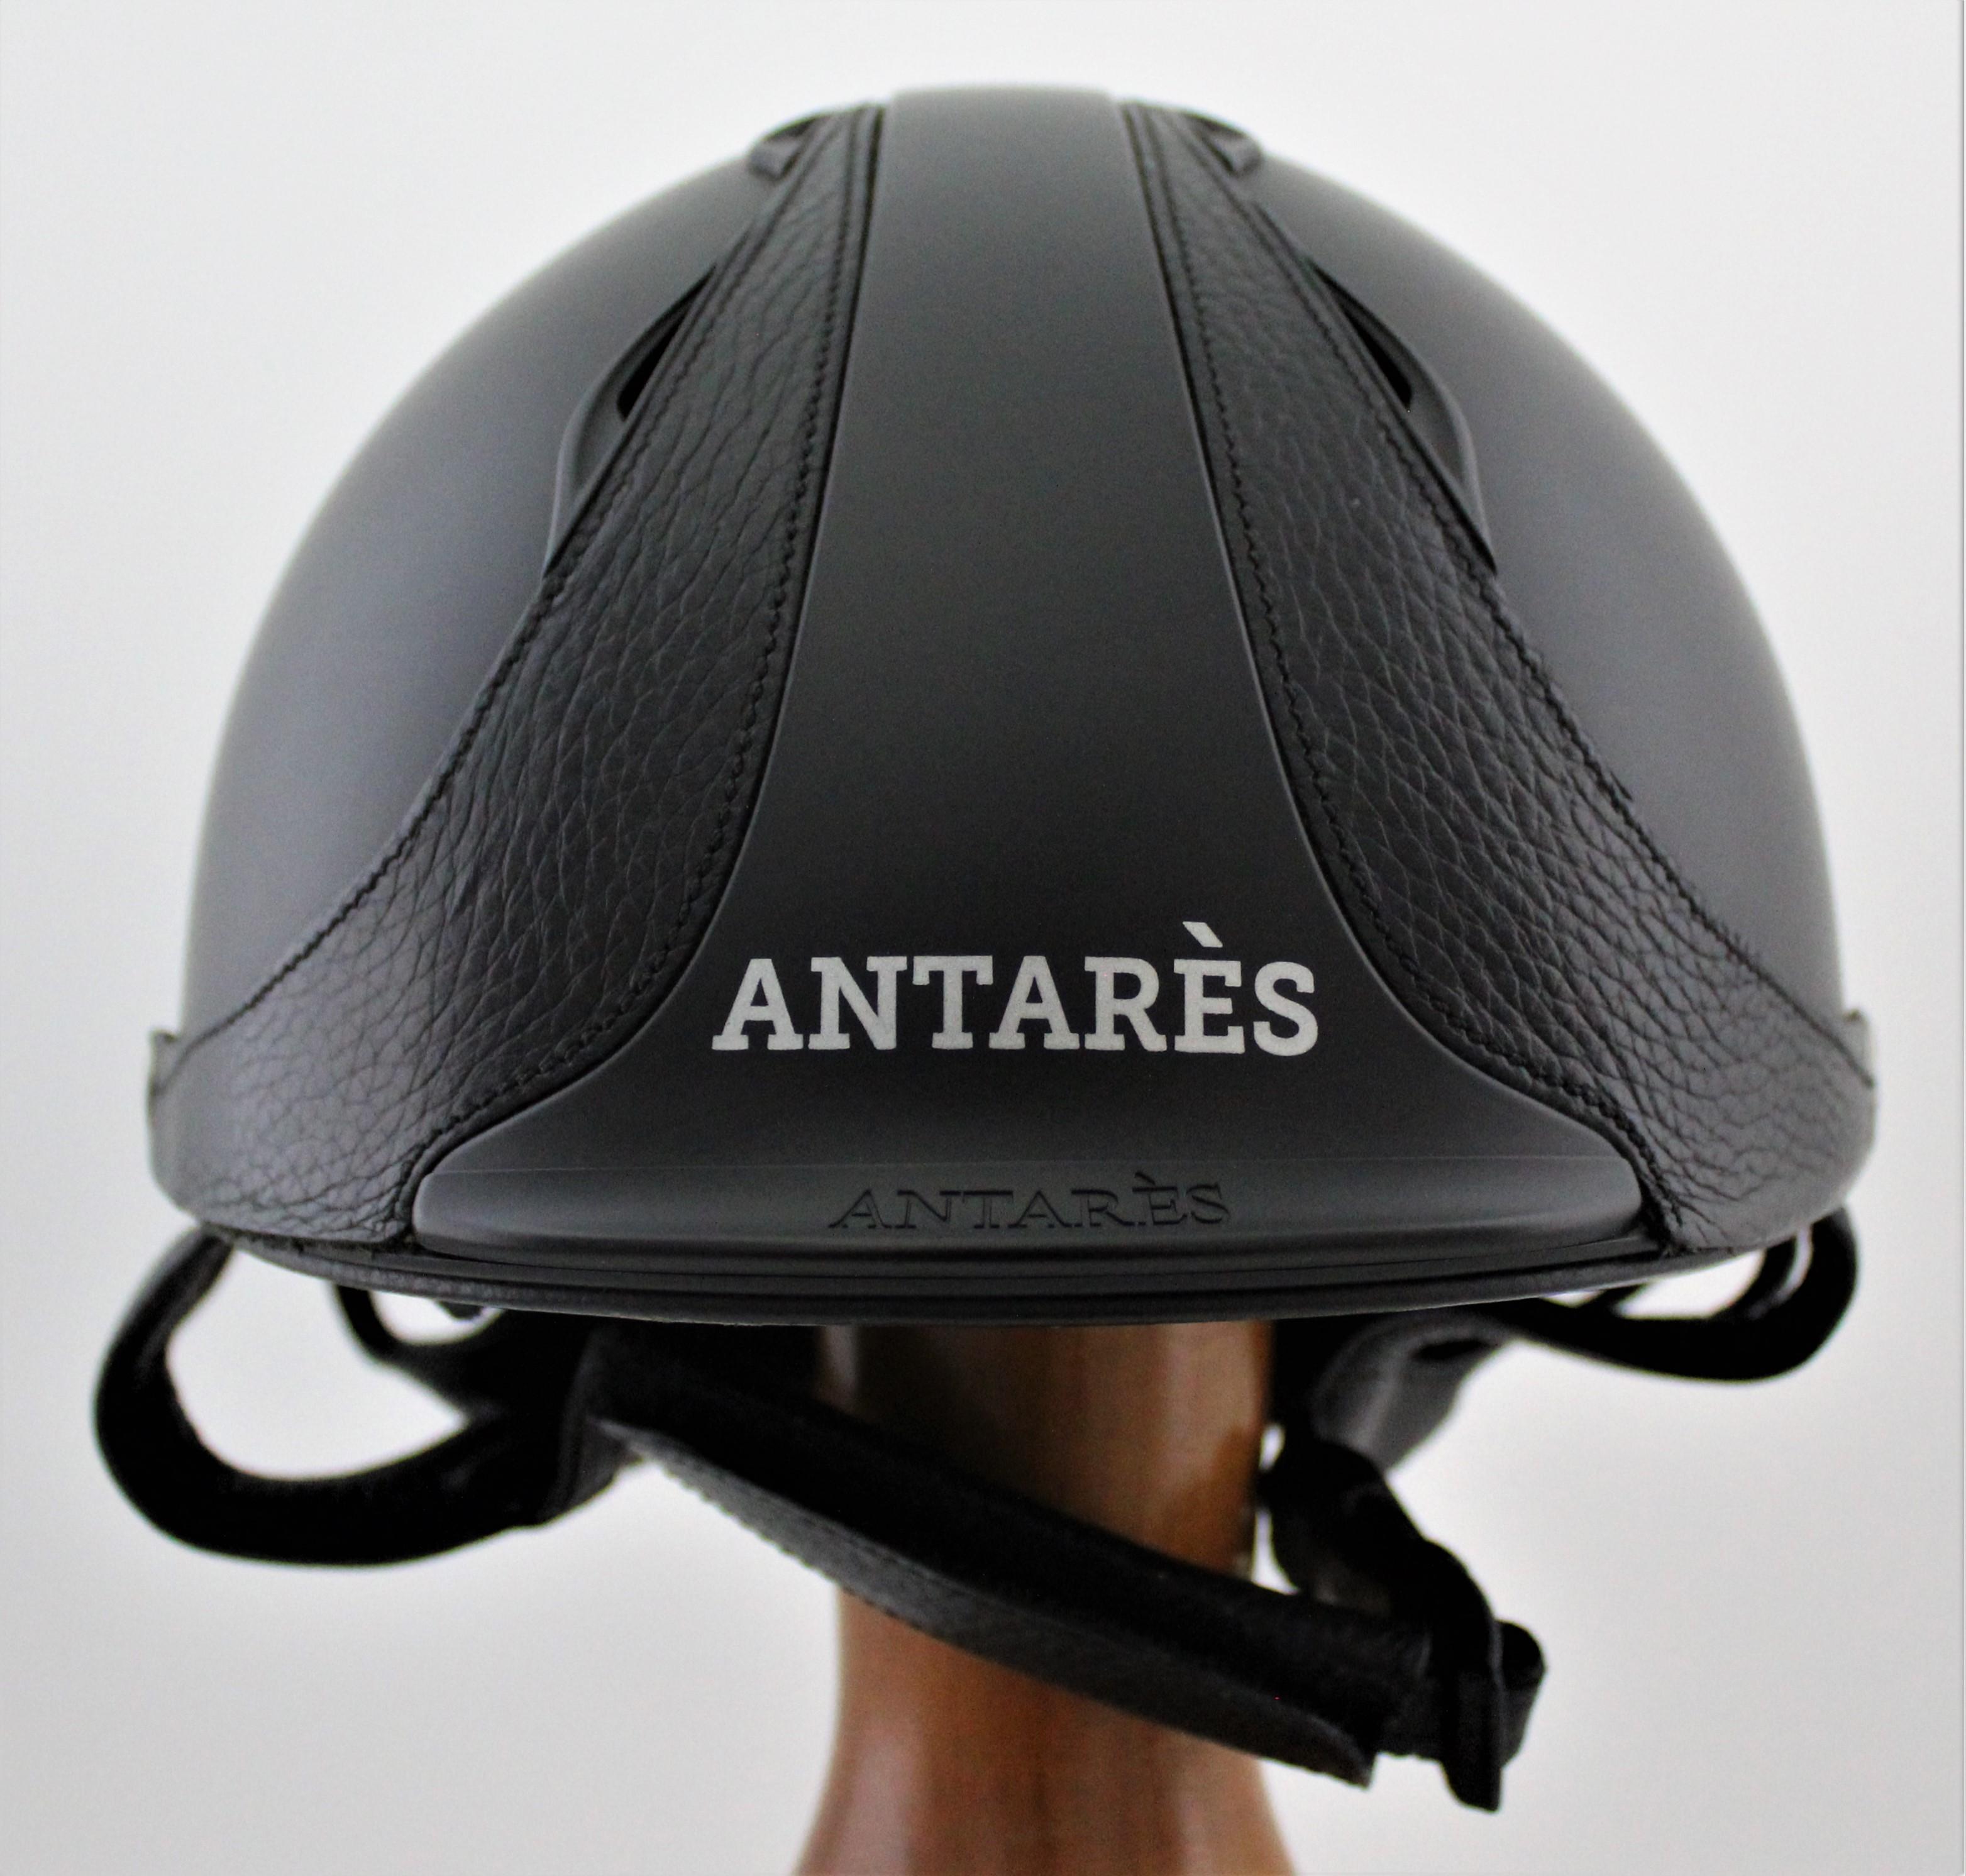 Antares Reference Race Helmet 16 1493 Matte Black Black S